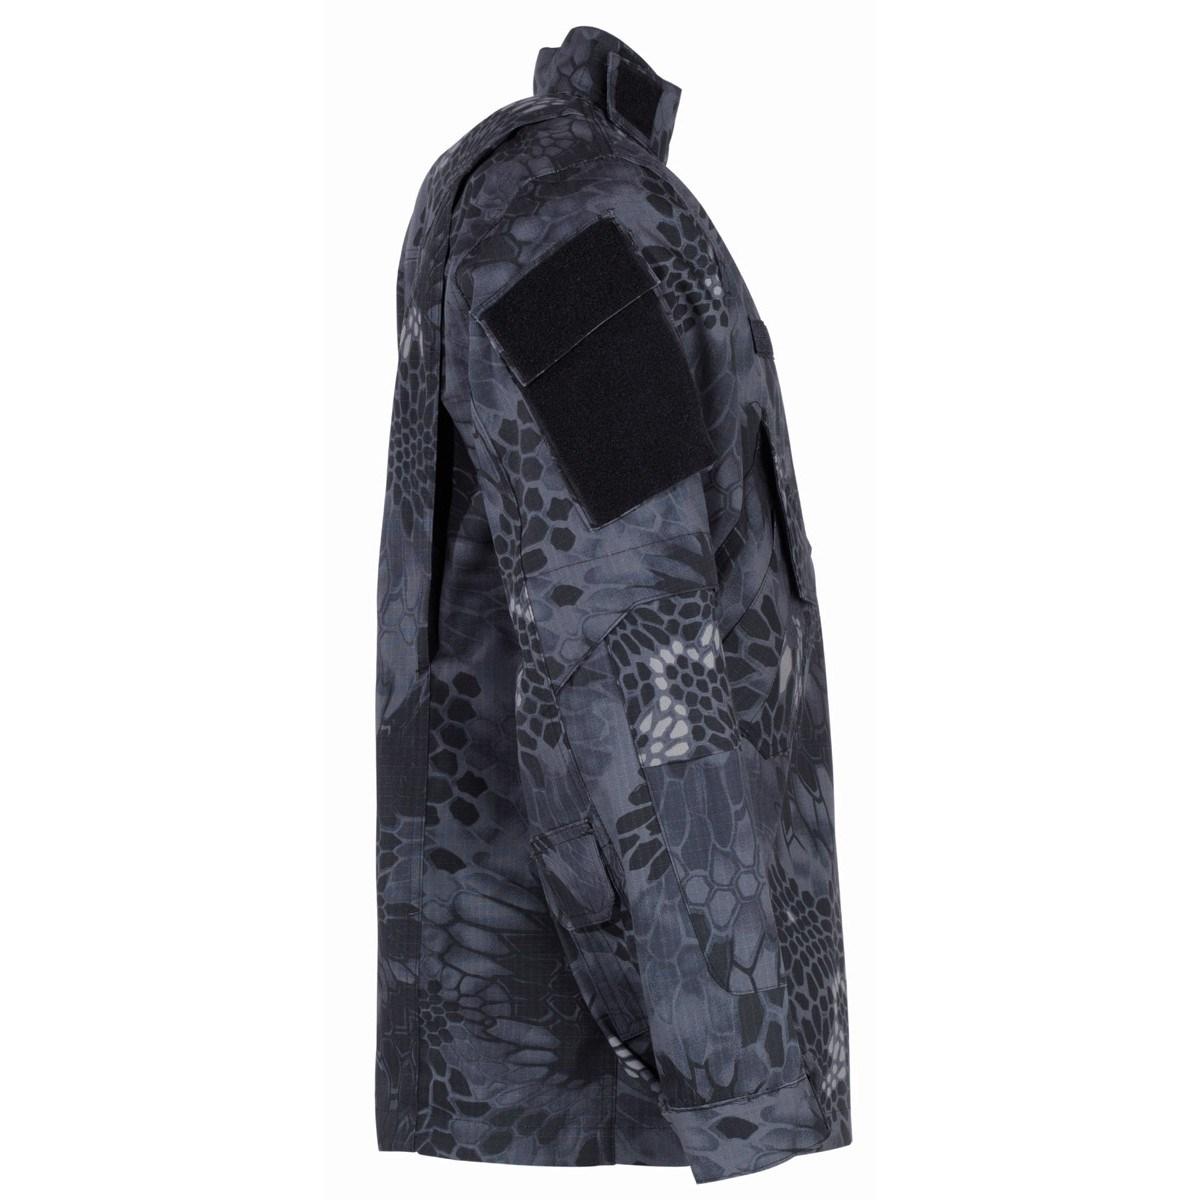 Blůza MISSION NY/CO SNAKE BLACK MFH Defence 03360N L-11